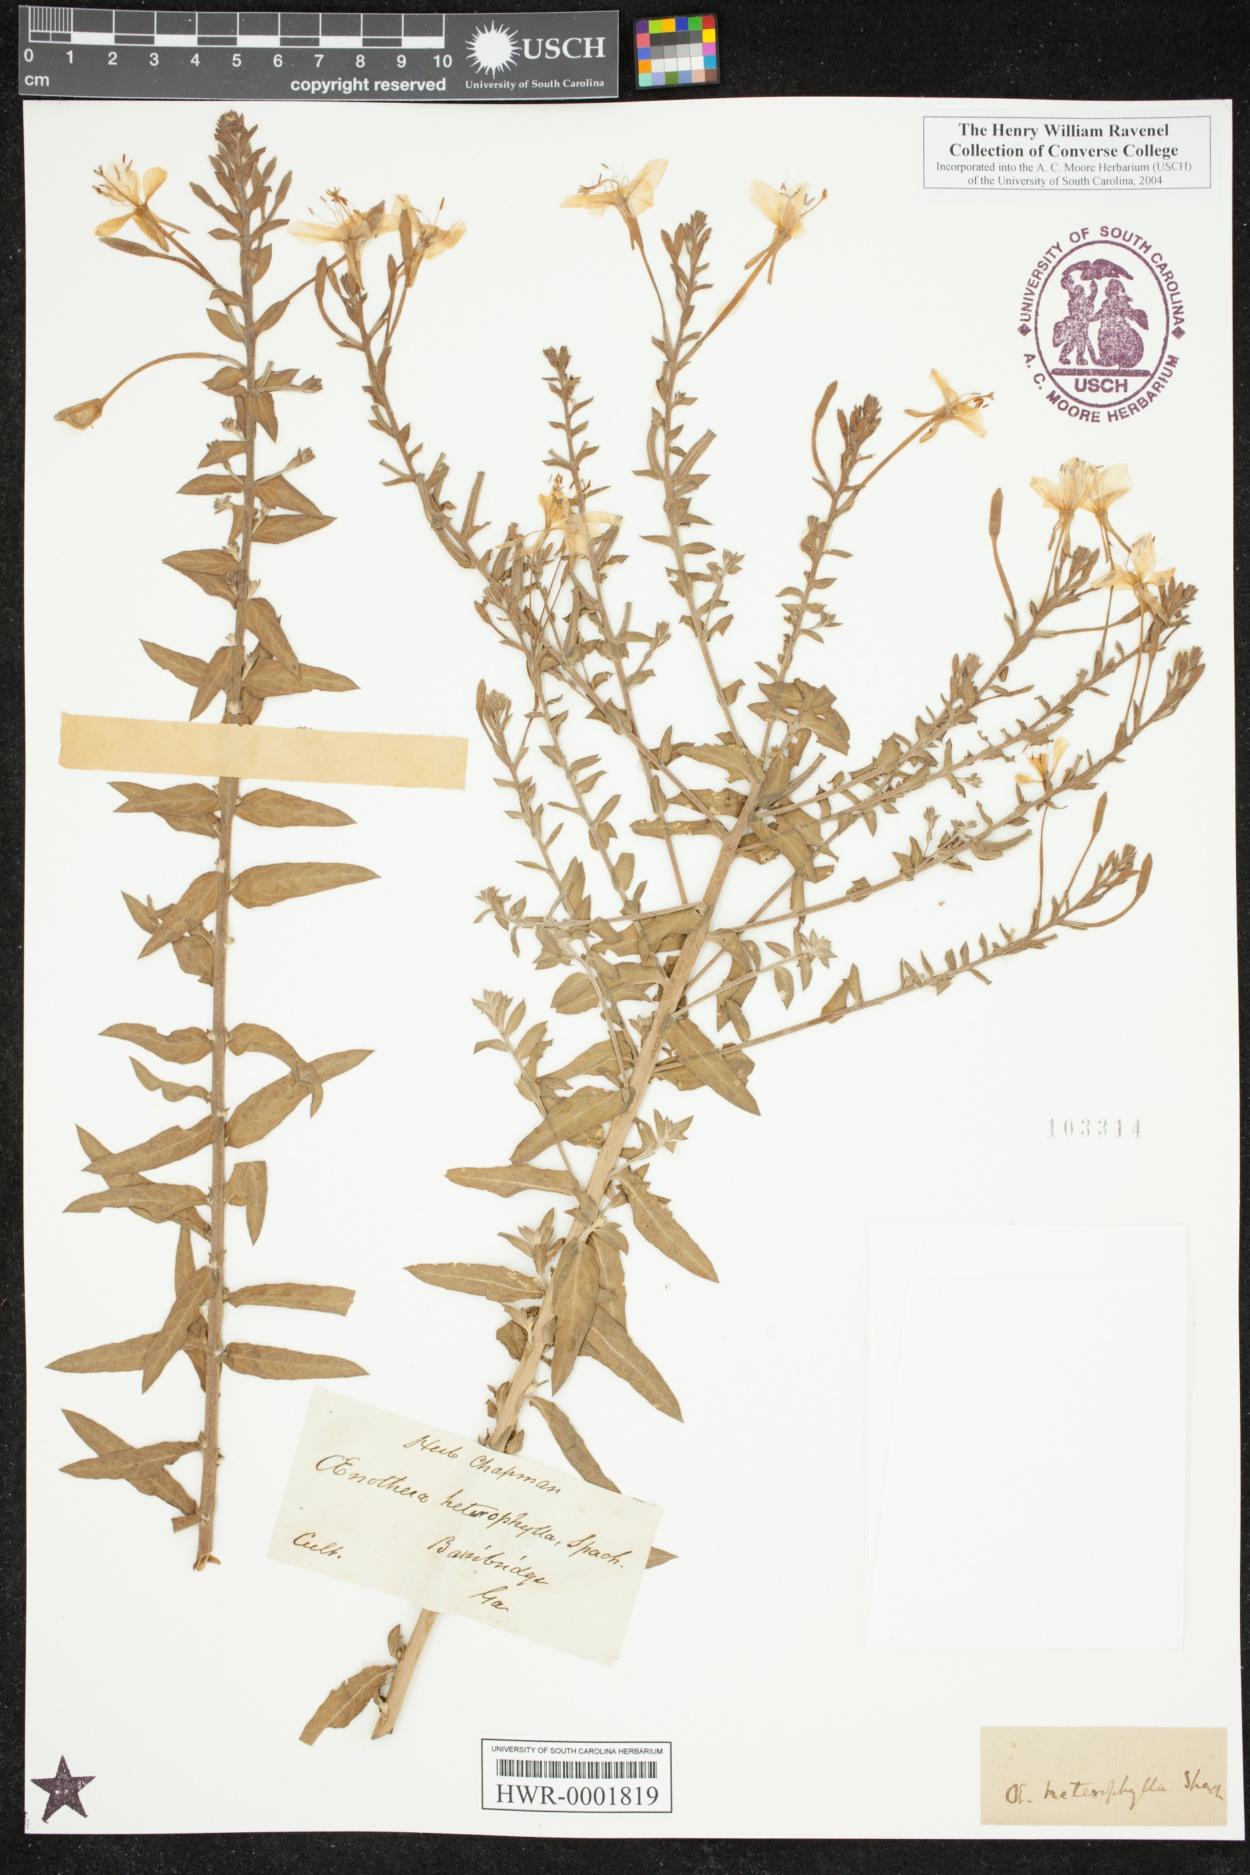 Oenothera heterophylla